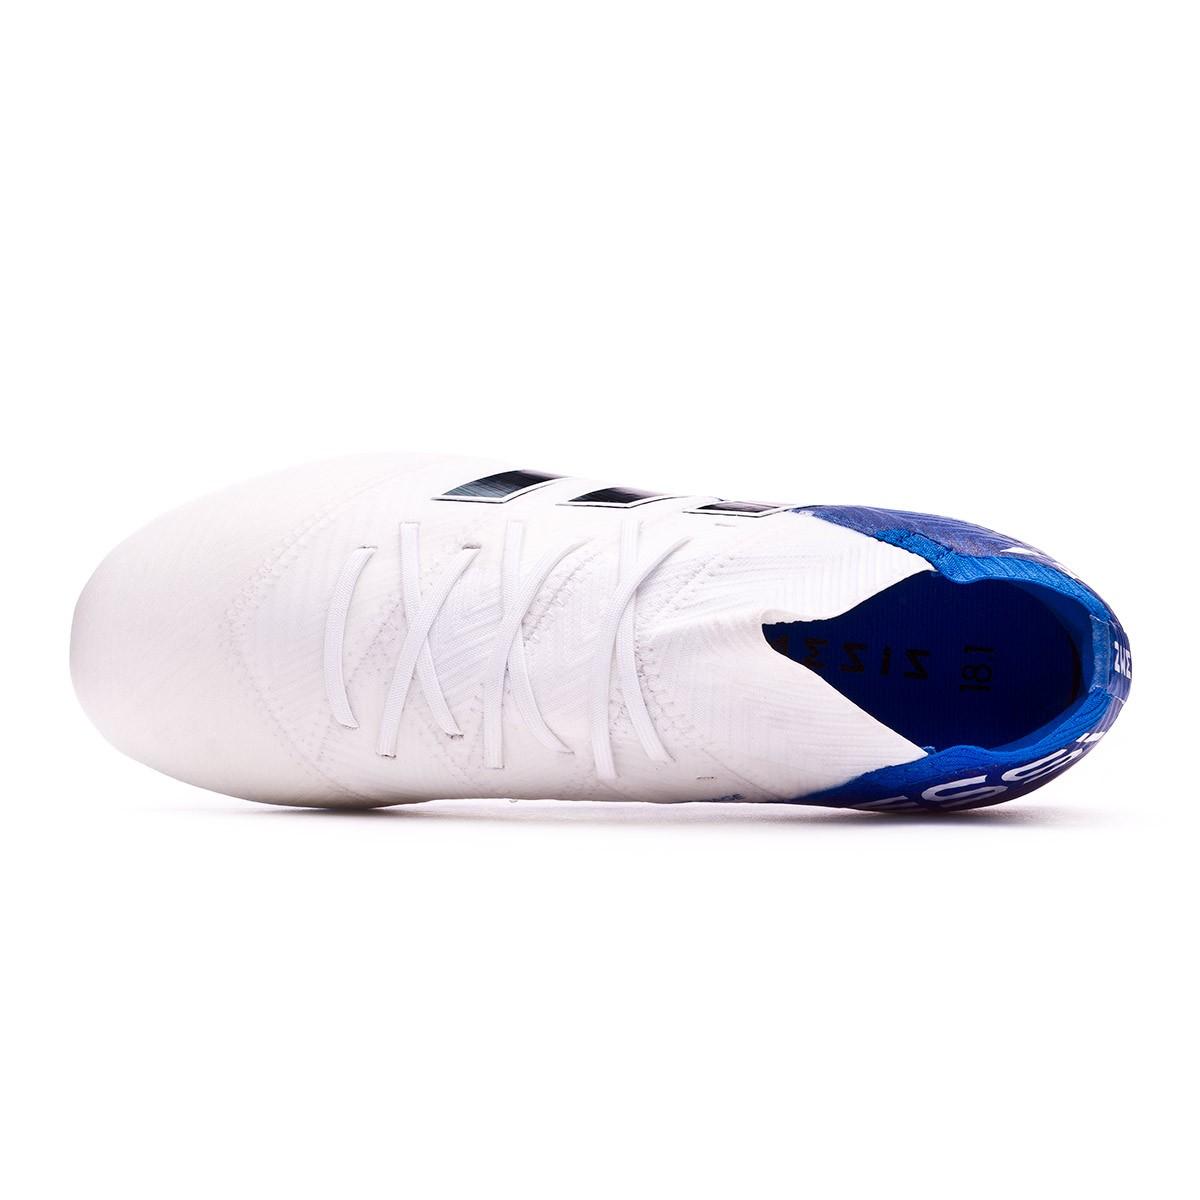 db9aa311ece3 Football Boots adidas Kids Nemeziz Messi 18.1 FG White-Core black-Football  blue - Football store Fútbol Emotion